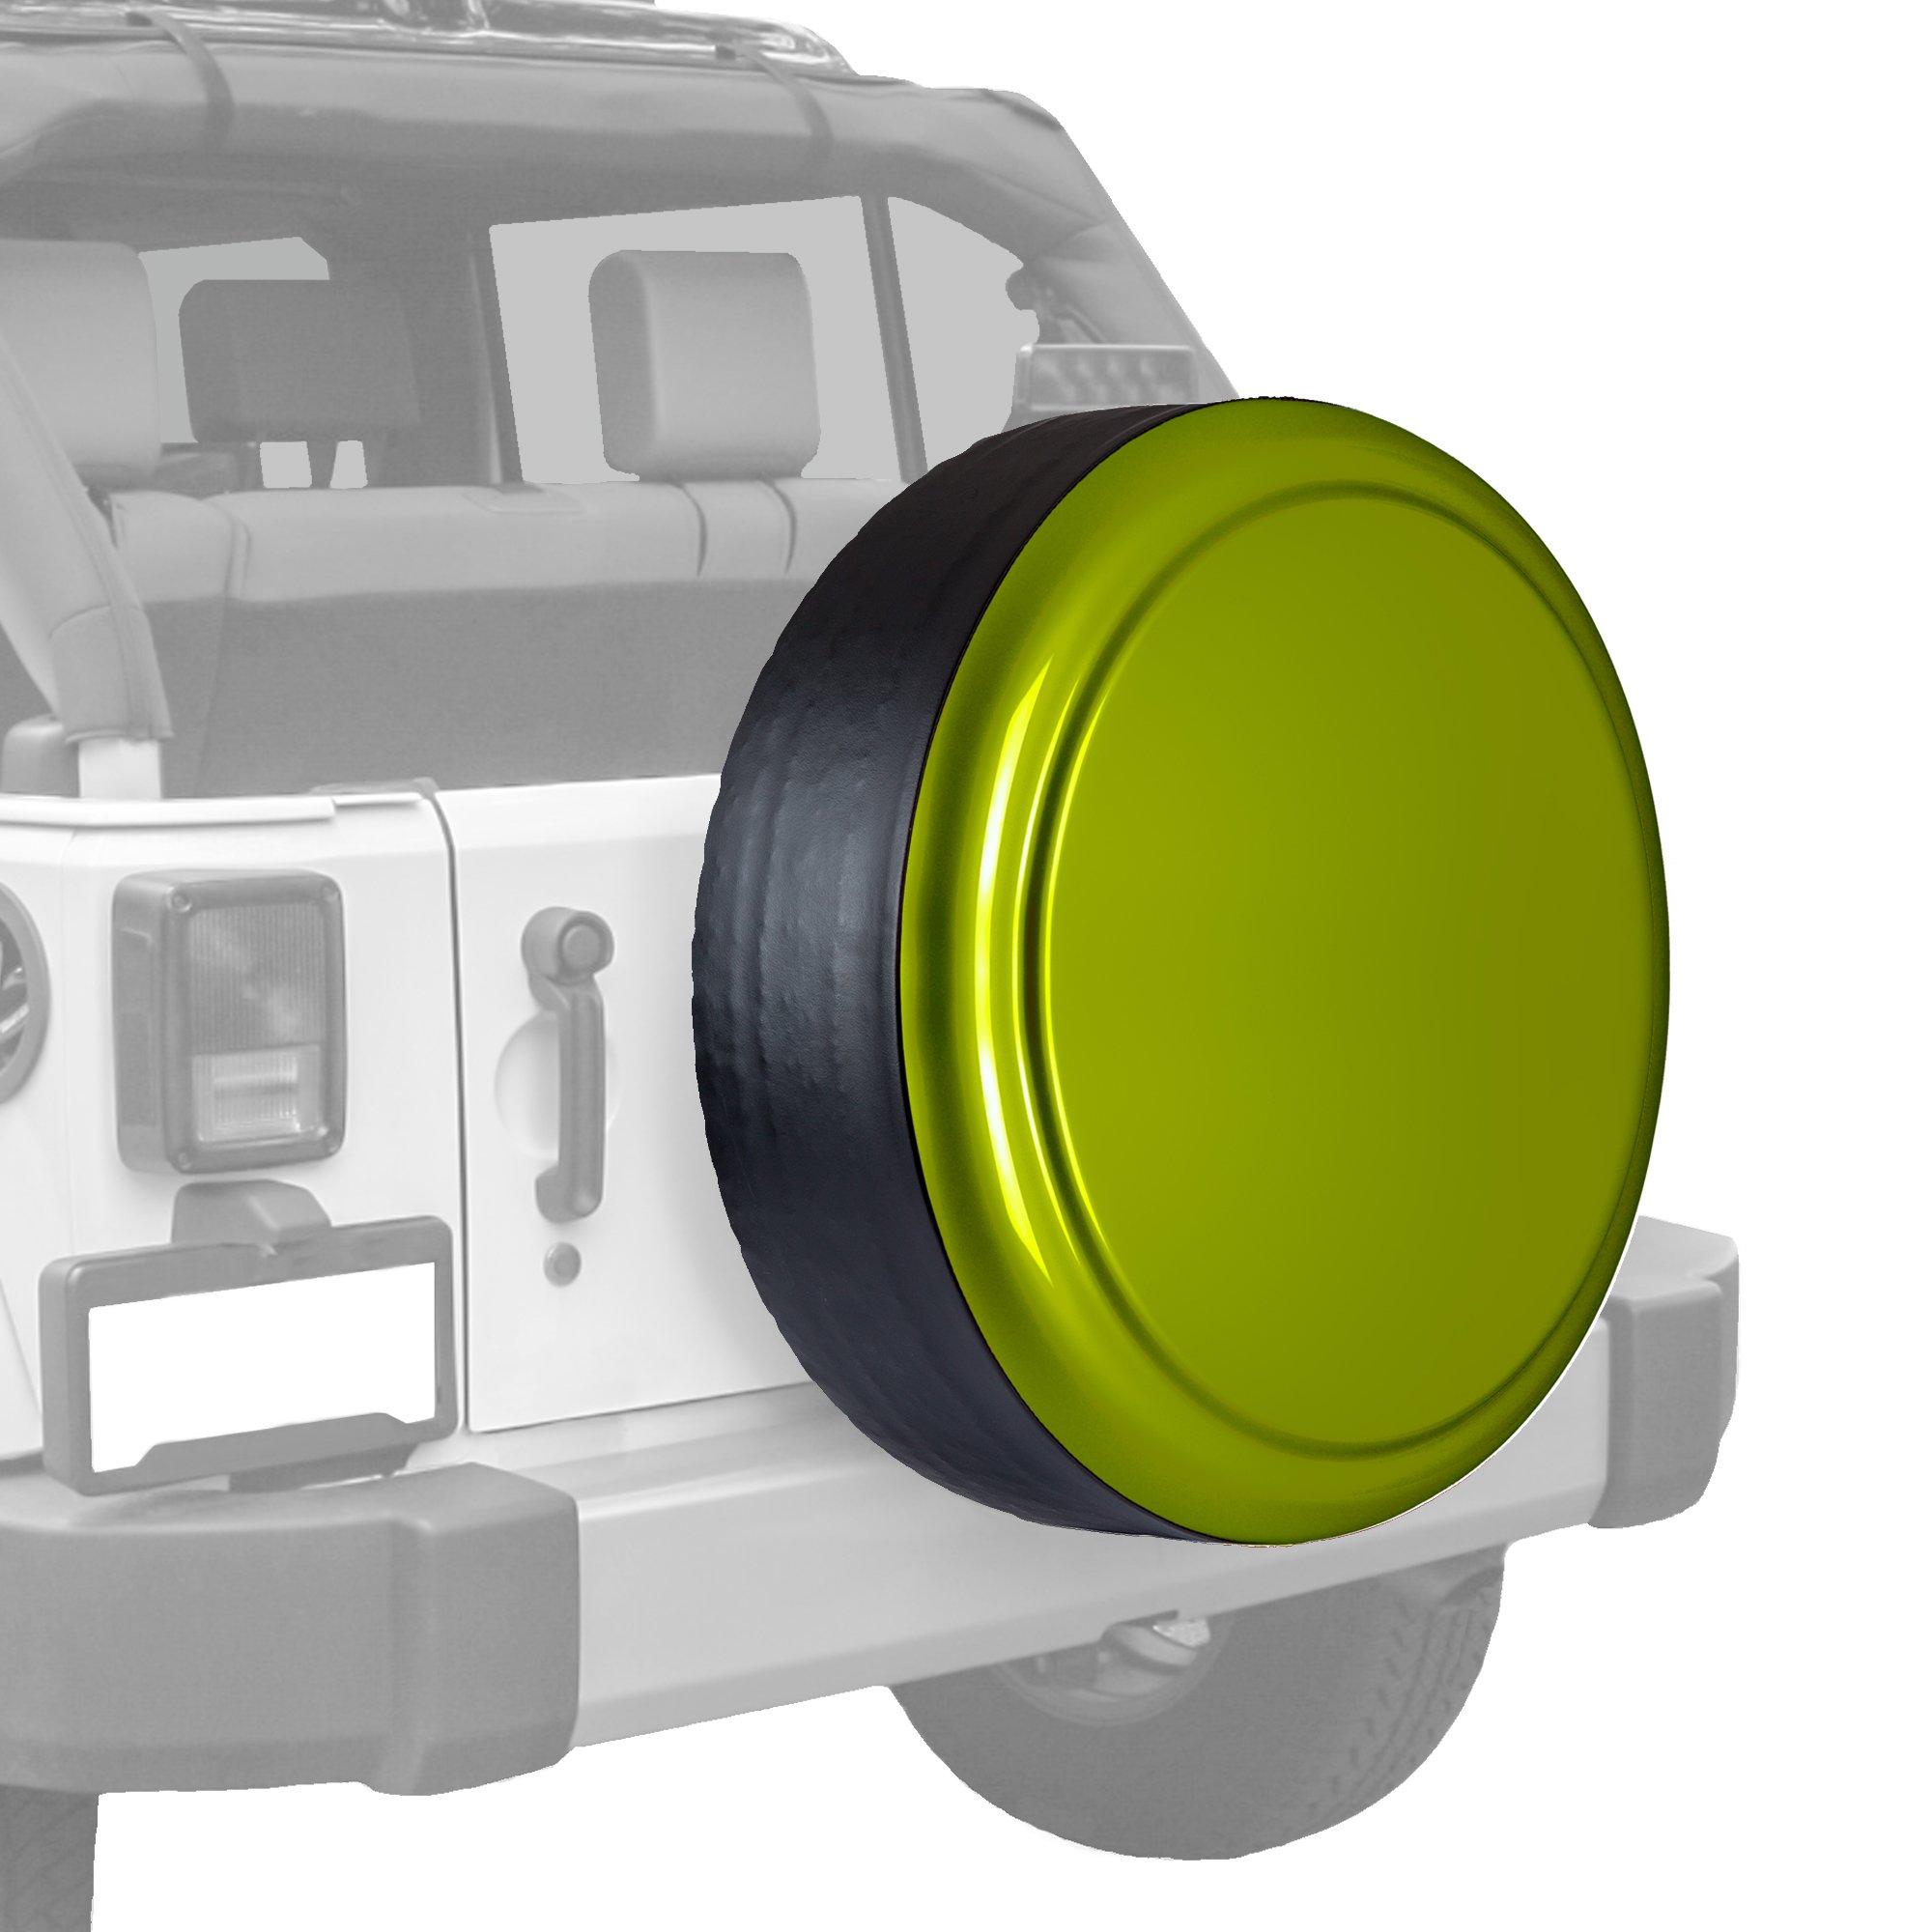 Boomerang Jeep Wrangler (JK) - 35'' Color Matched Rigid Tire Cover (Plastic Face & Vinyl Band) - Rescue Green